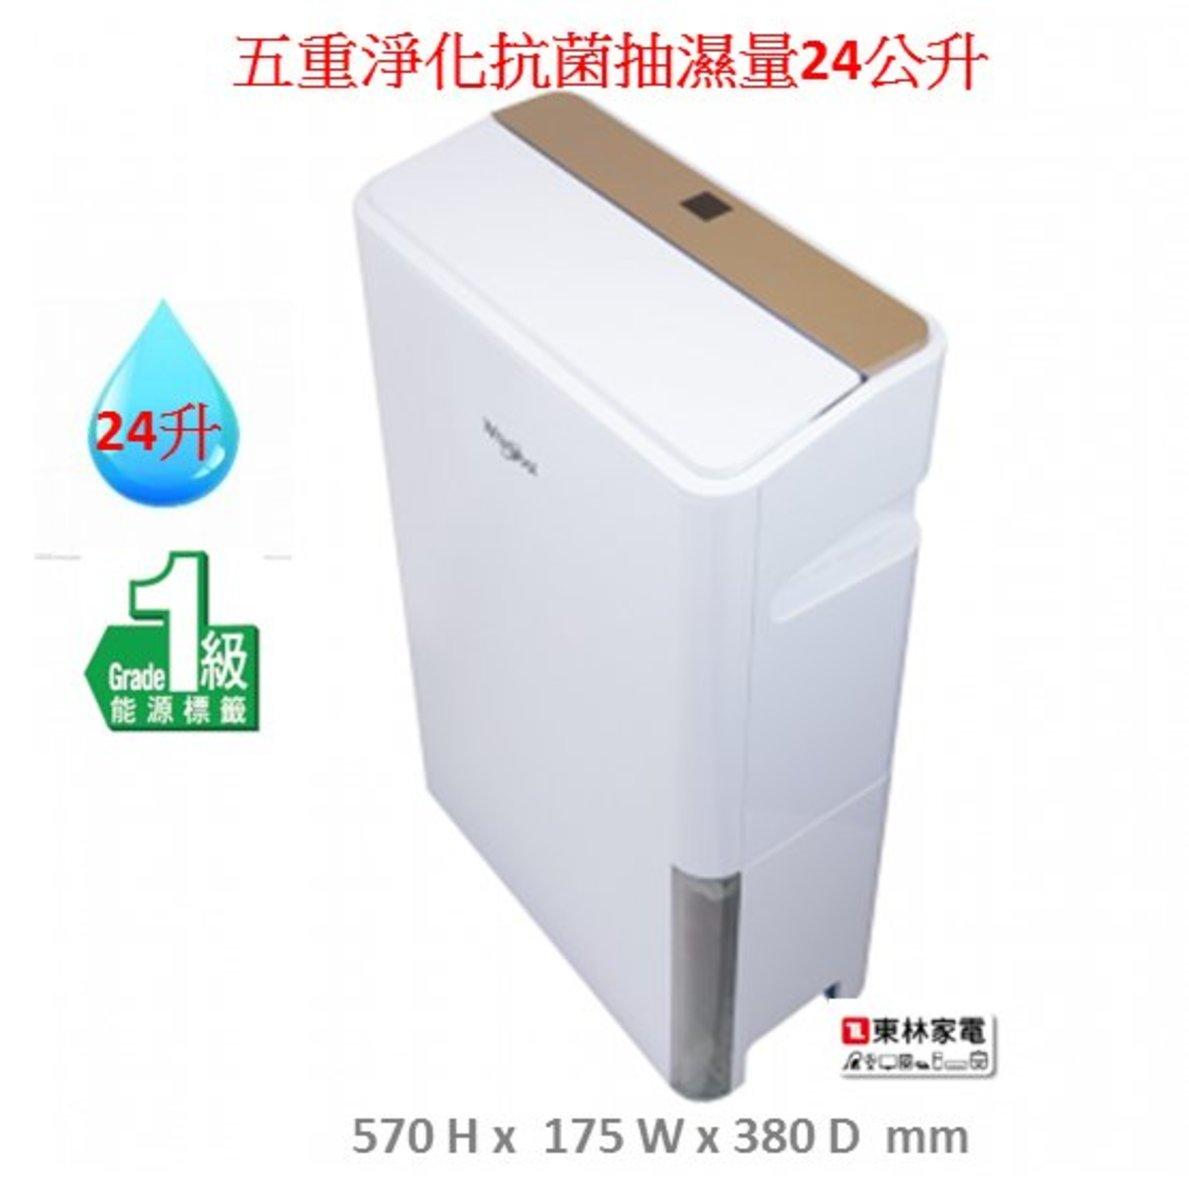 2合1, Pro抽濕淨化機, 24公升DS-241HW